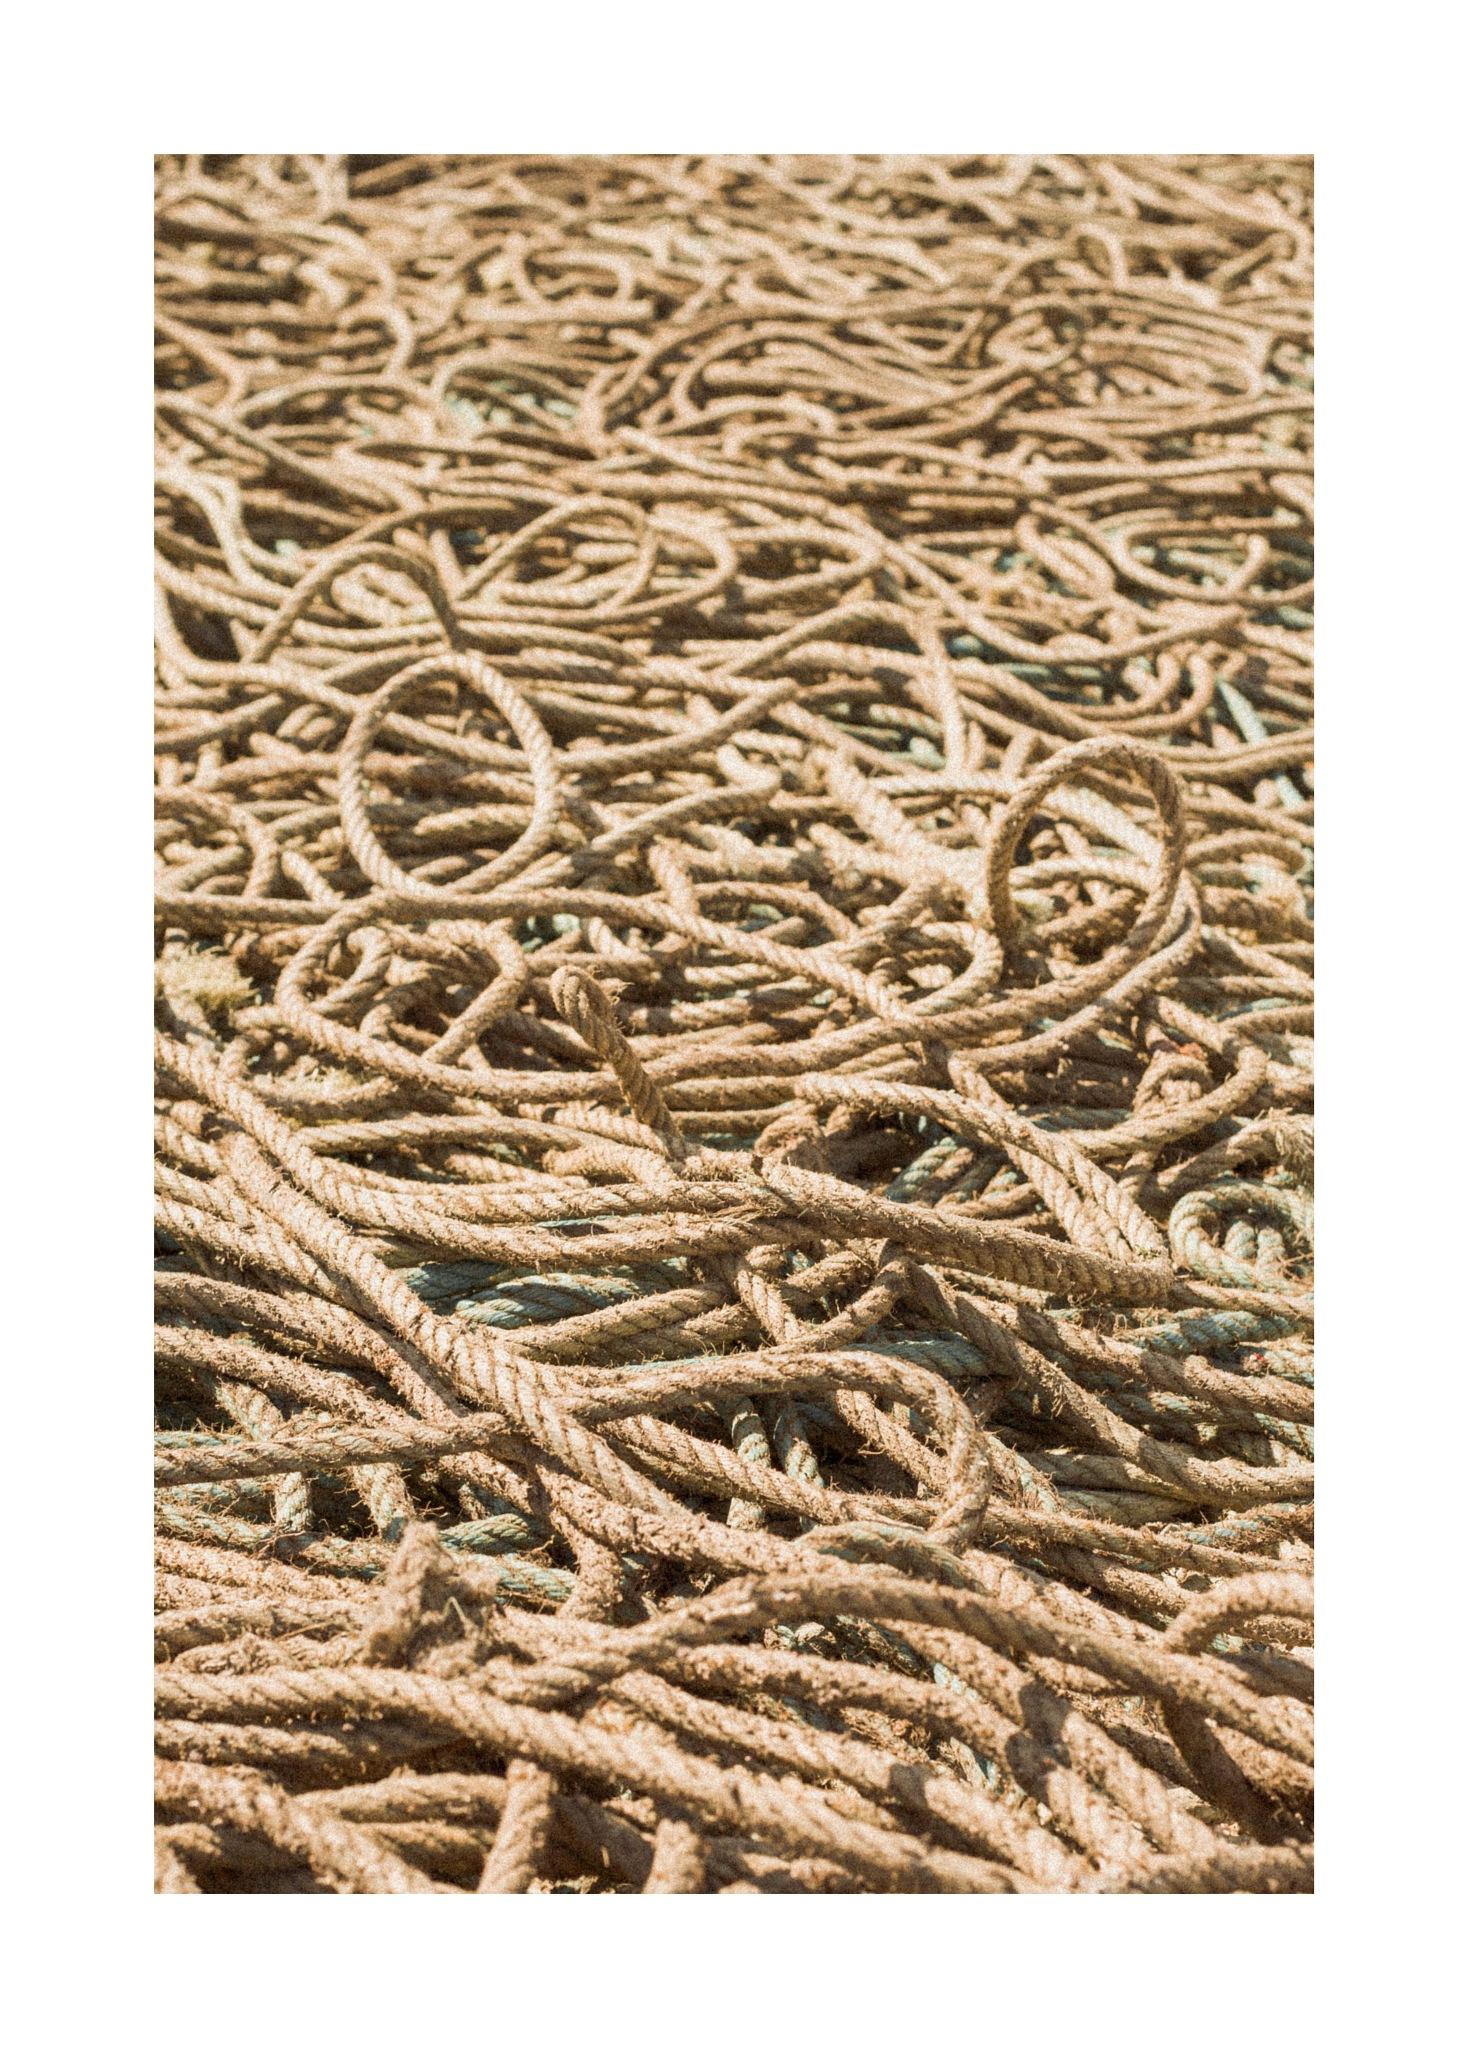 Fisherman ropes by Giorgio_ourmoney